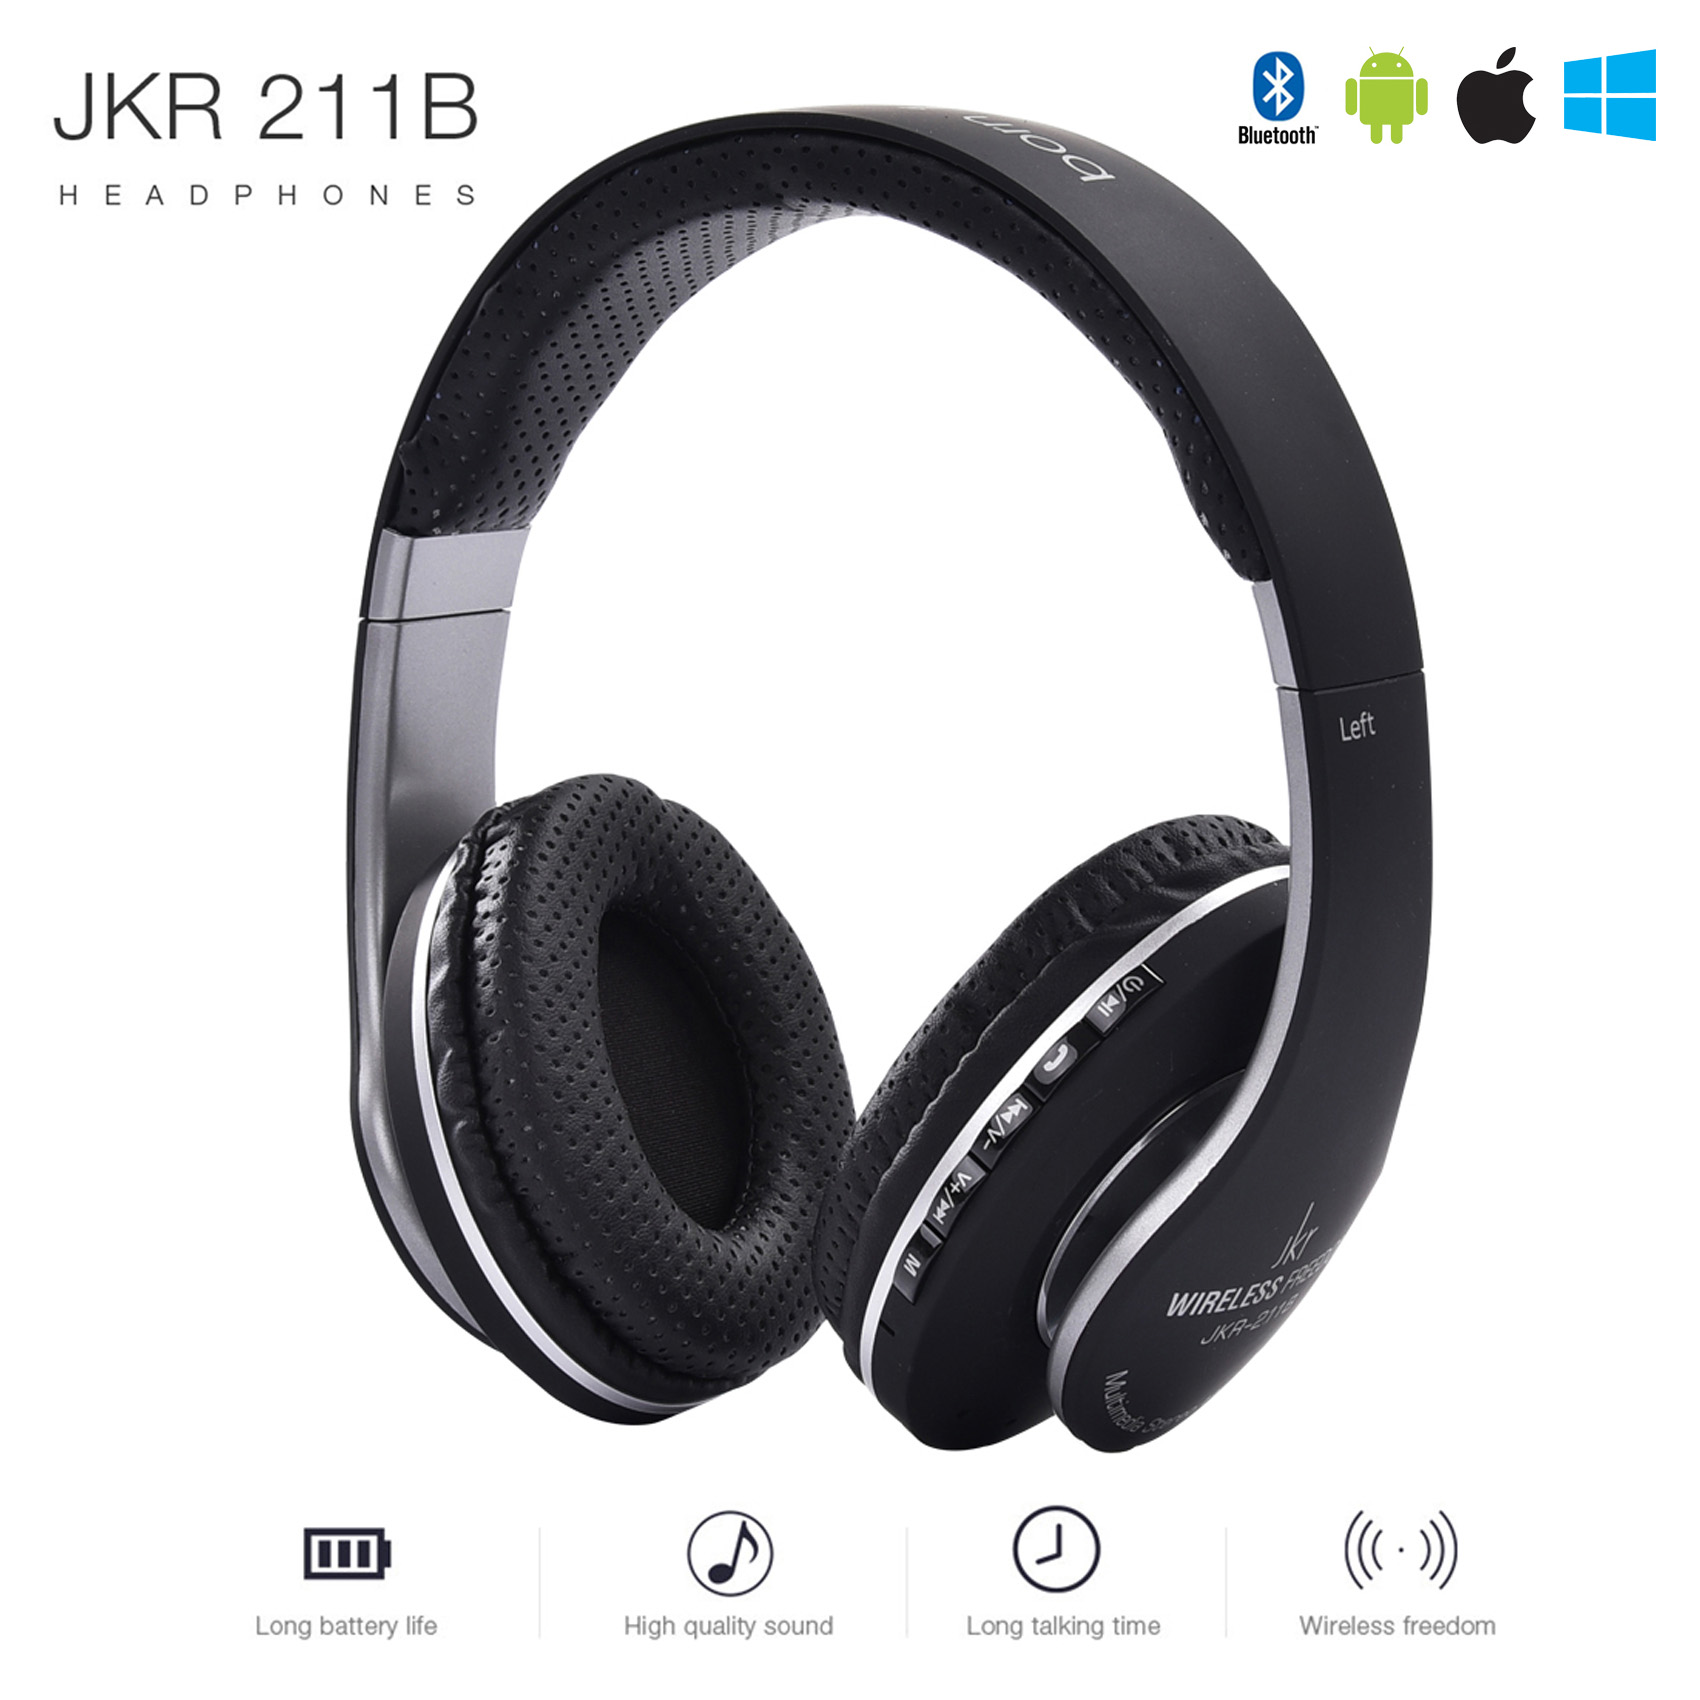 JKR Bluetooth Extra Bass Headphone - Black